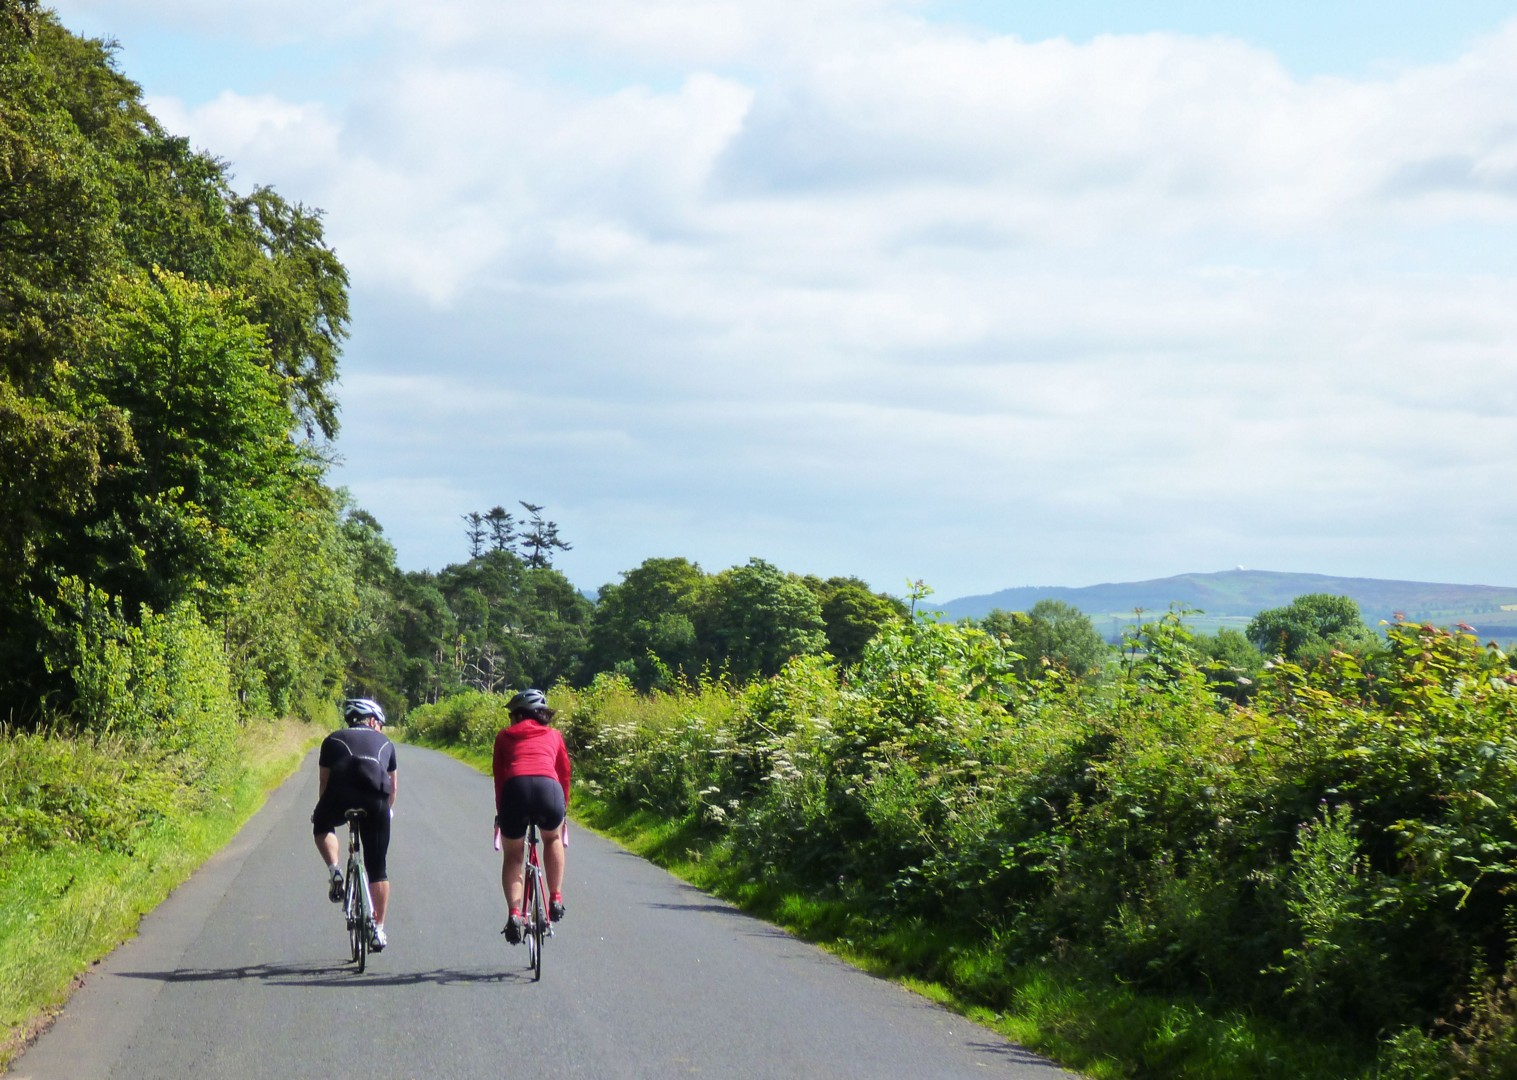 guided-road-cycling-weekend-uk.jpg - UK - Northumberland - Road Cycling